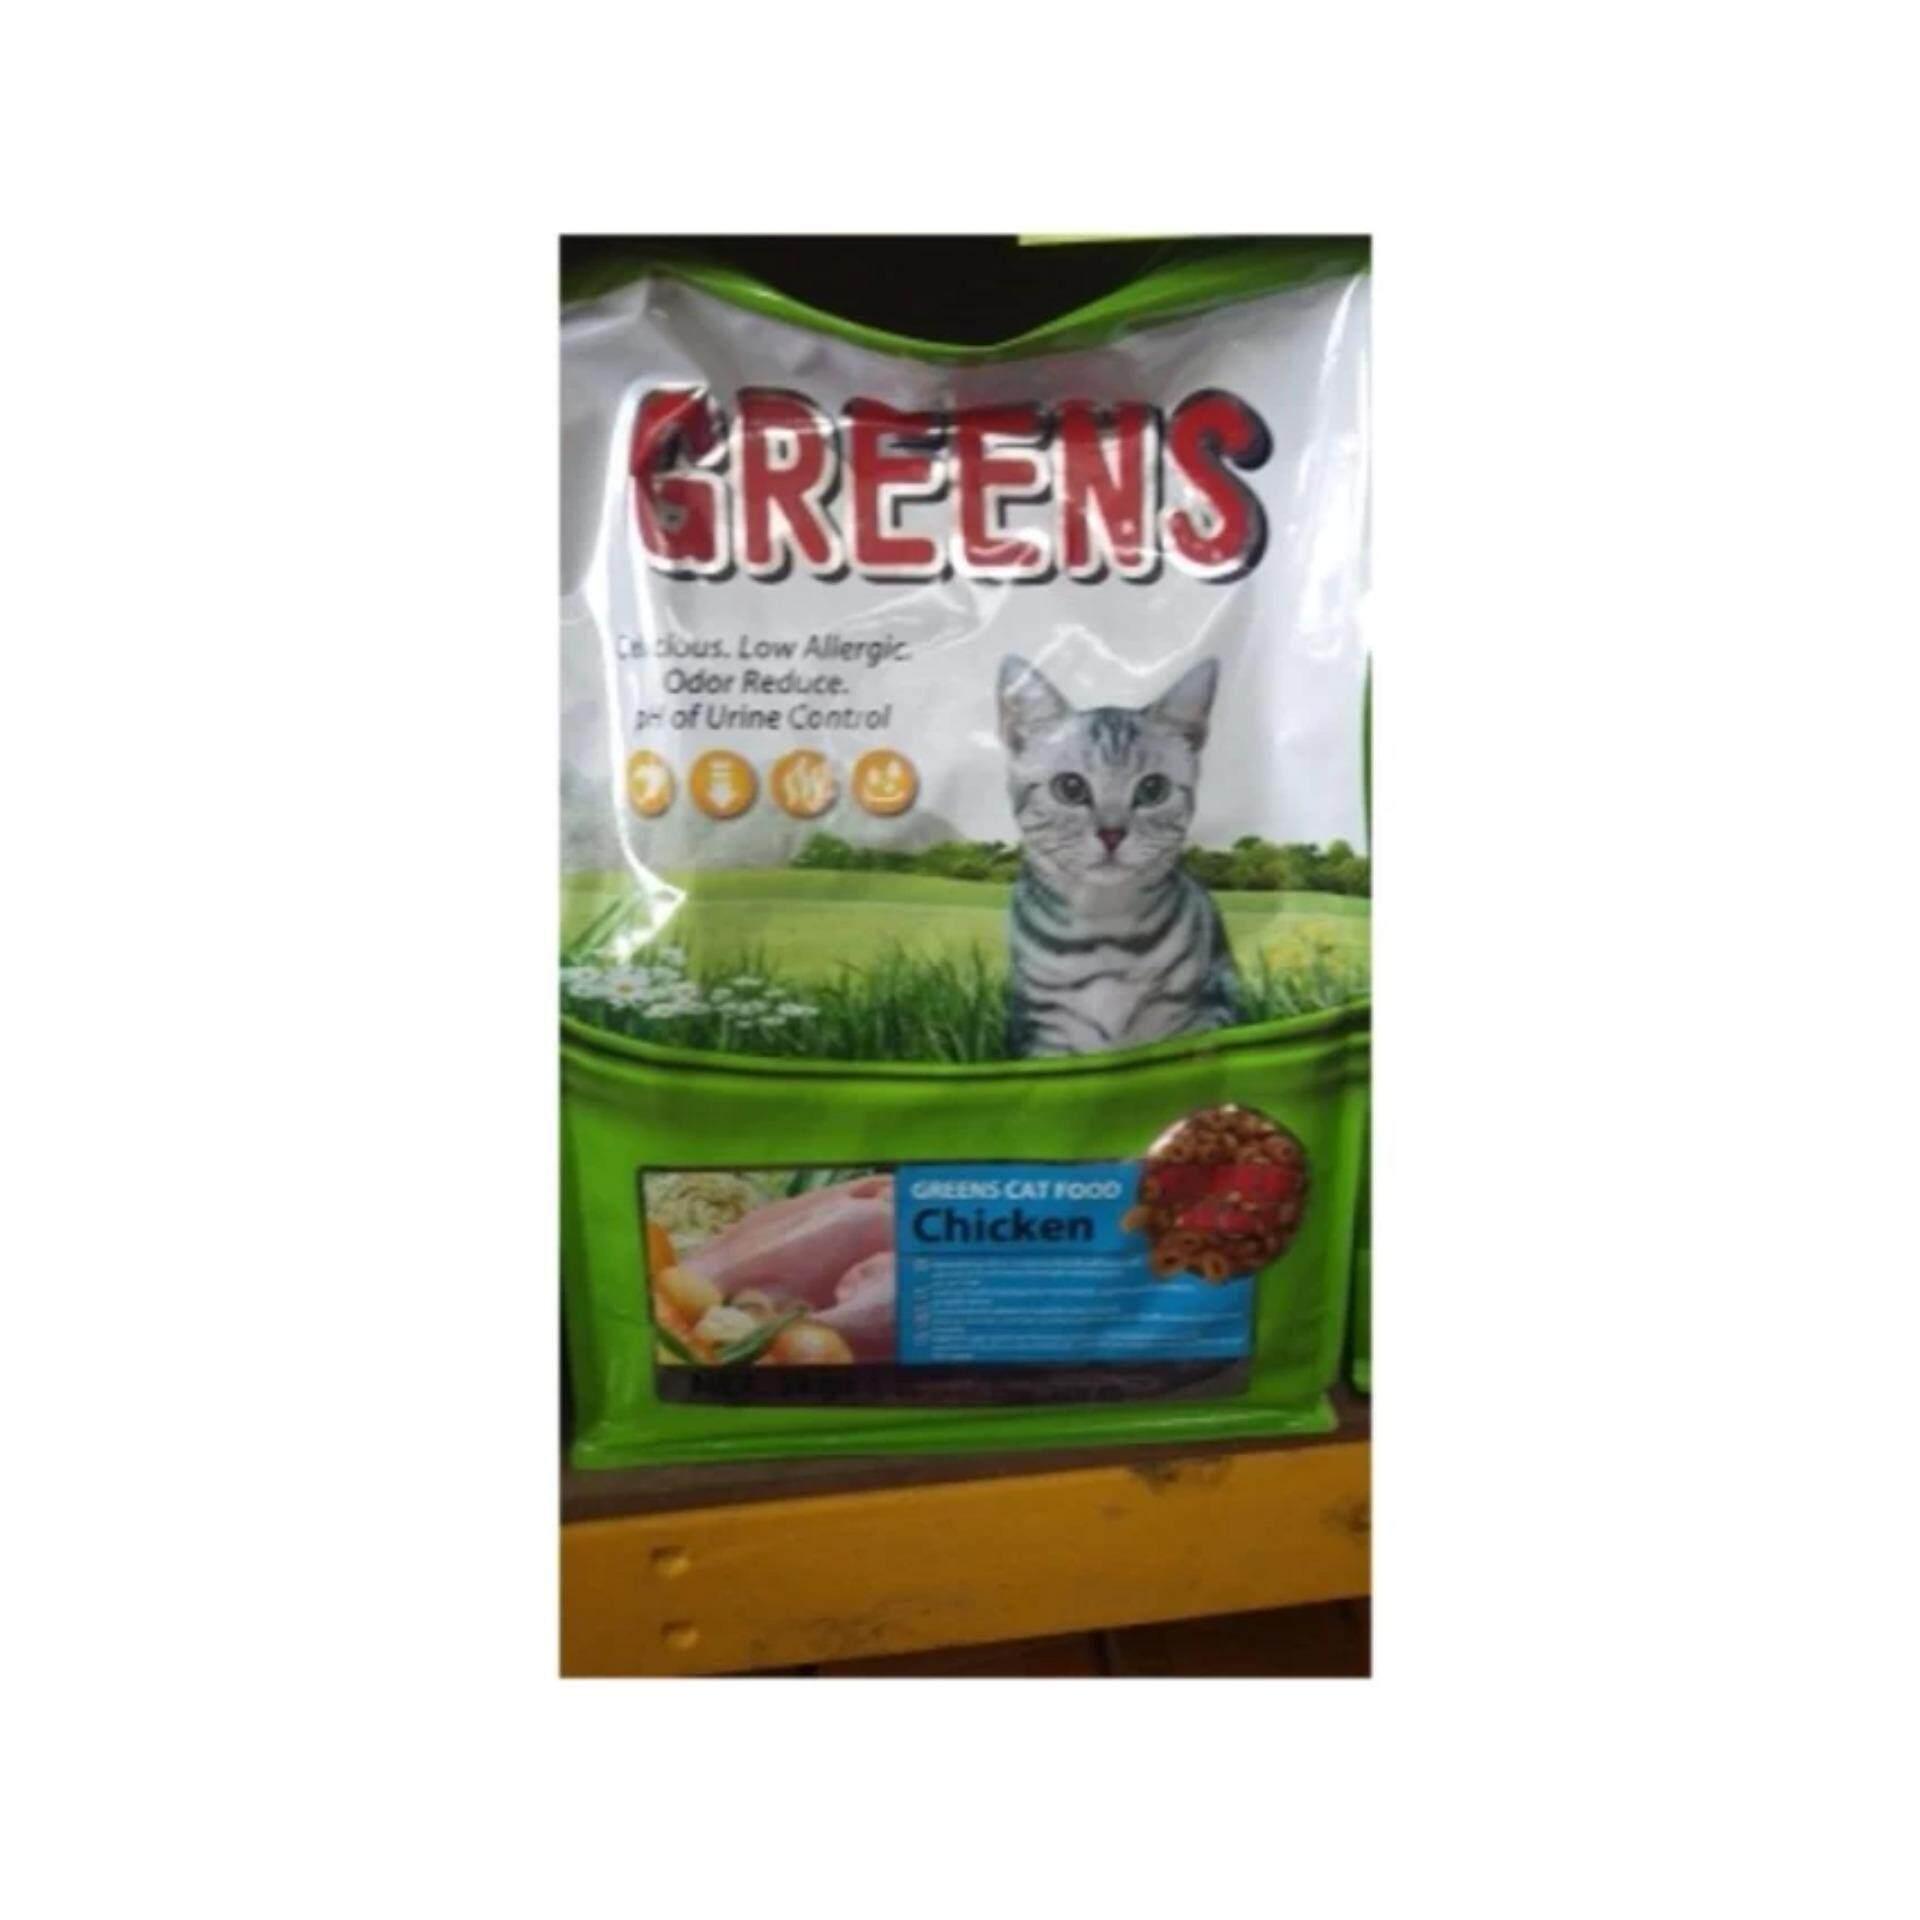 Greens Cat Food - Chicken (Greens) 3KG